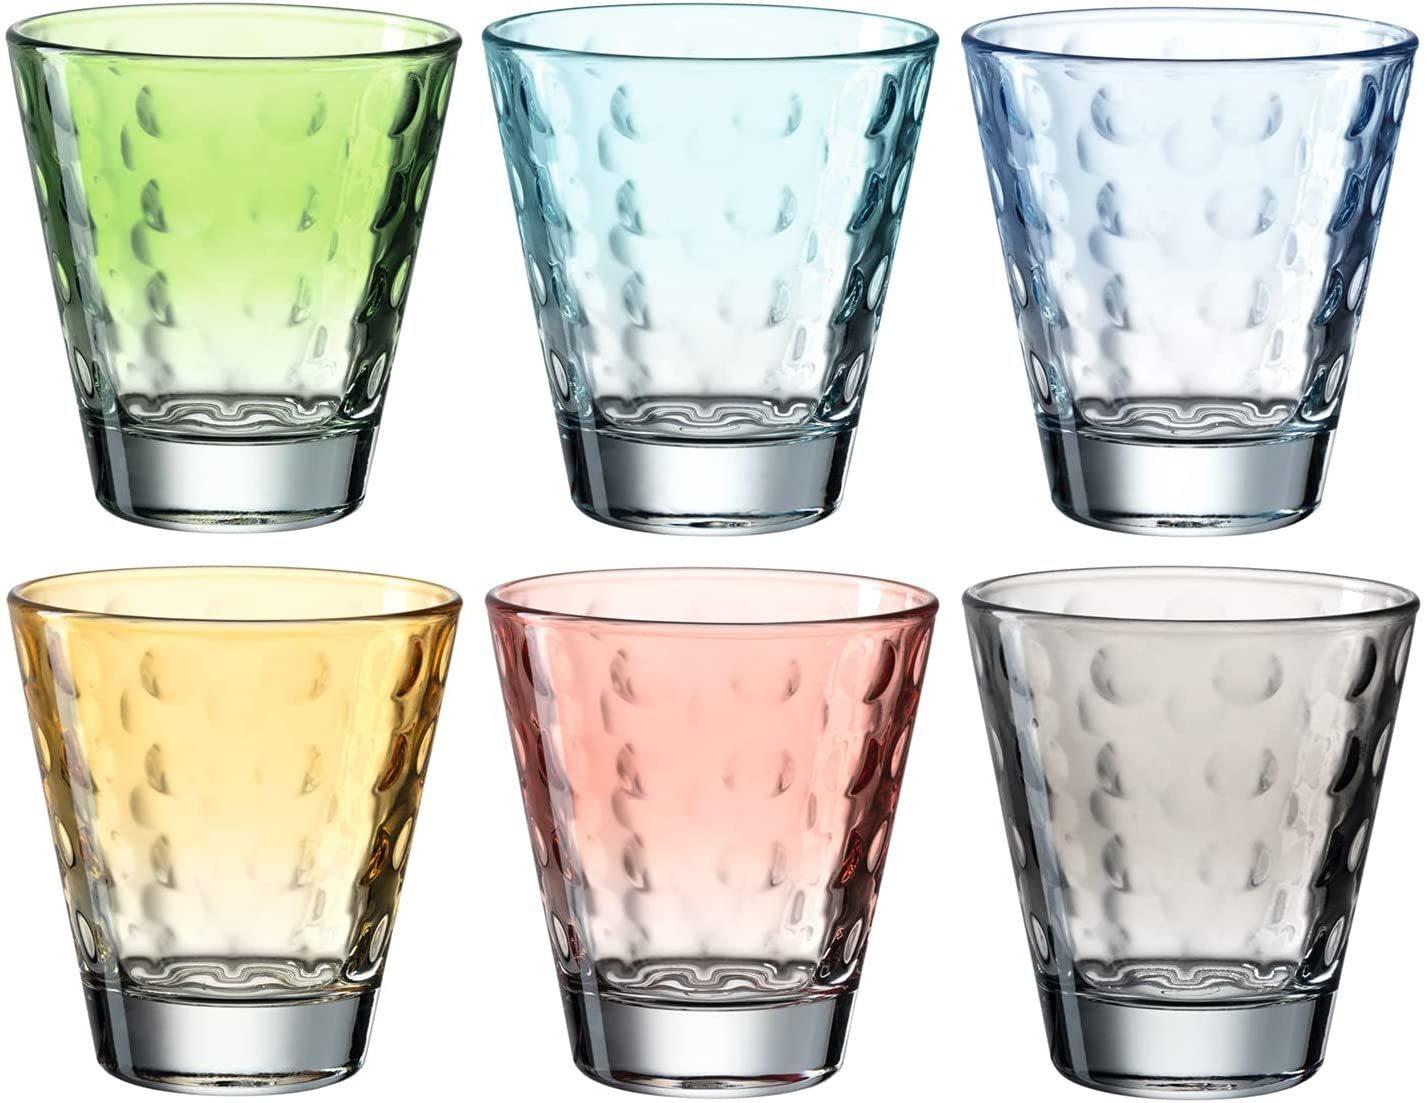 Leonardo Ποτήρια Ουίσκι Παστέλ Optic 215ml - Σετ 6 Τεμαχίων